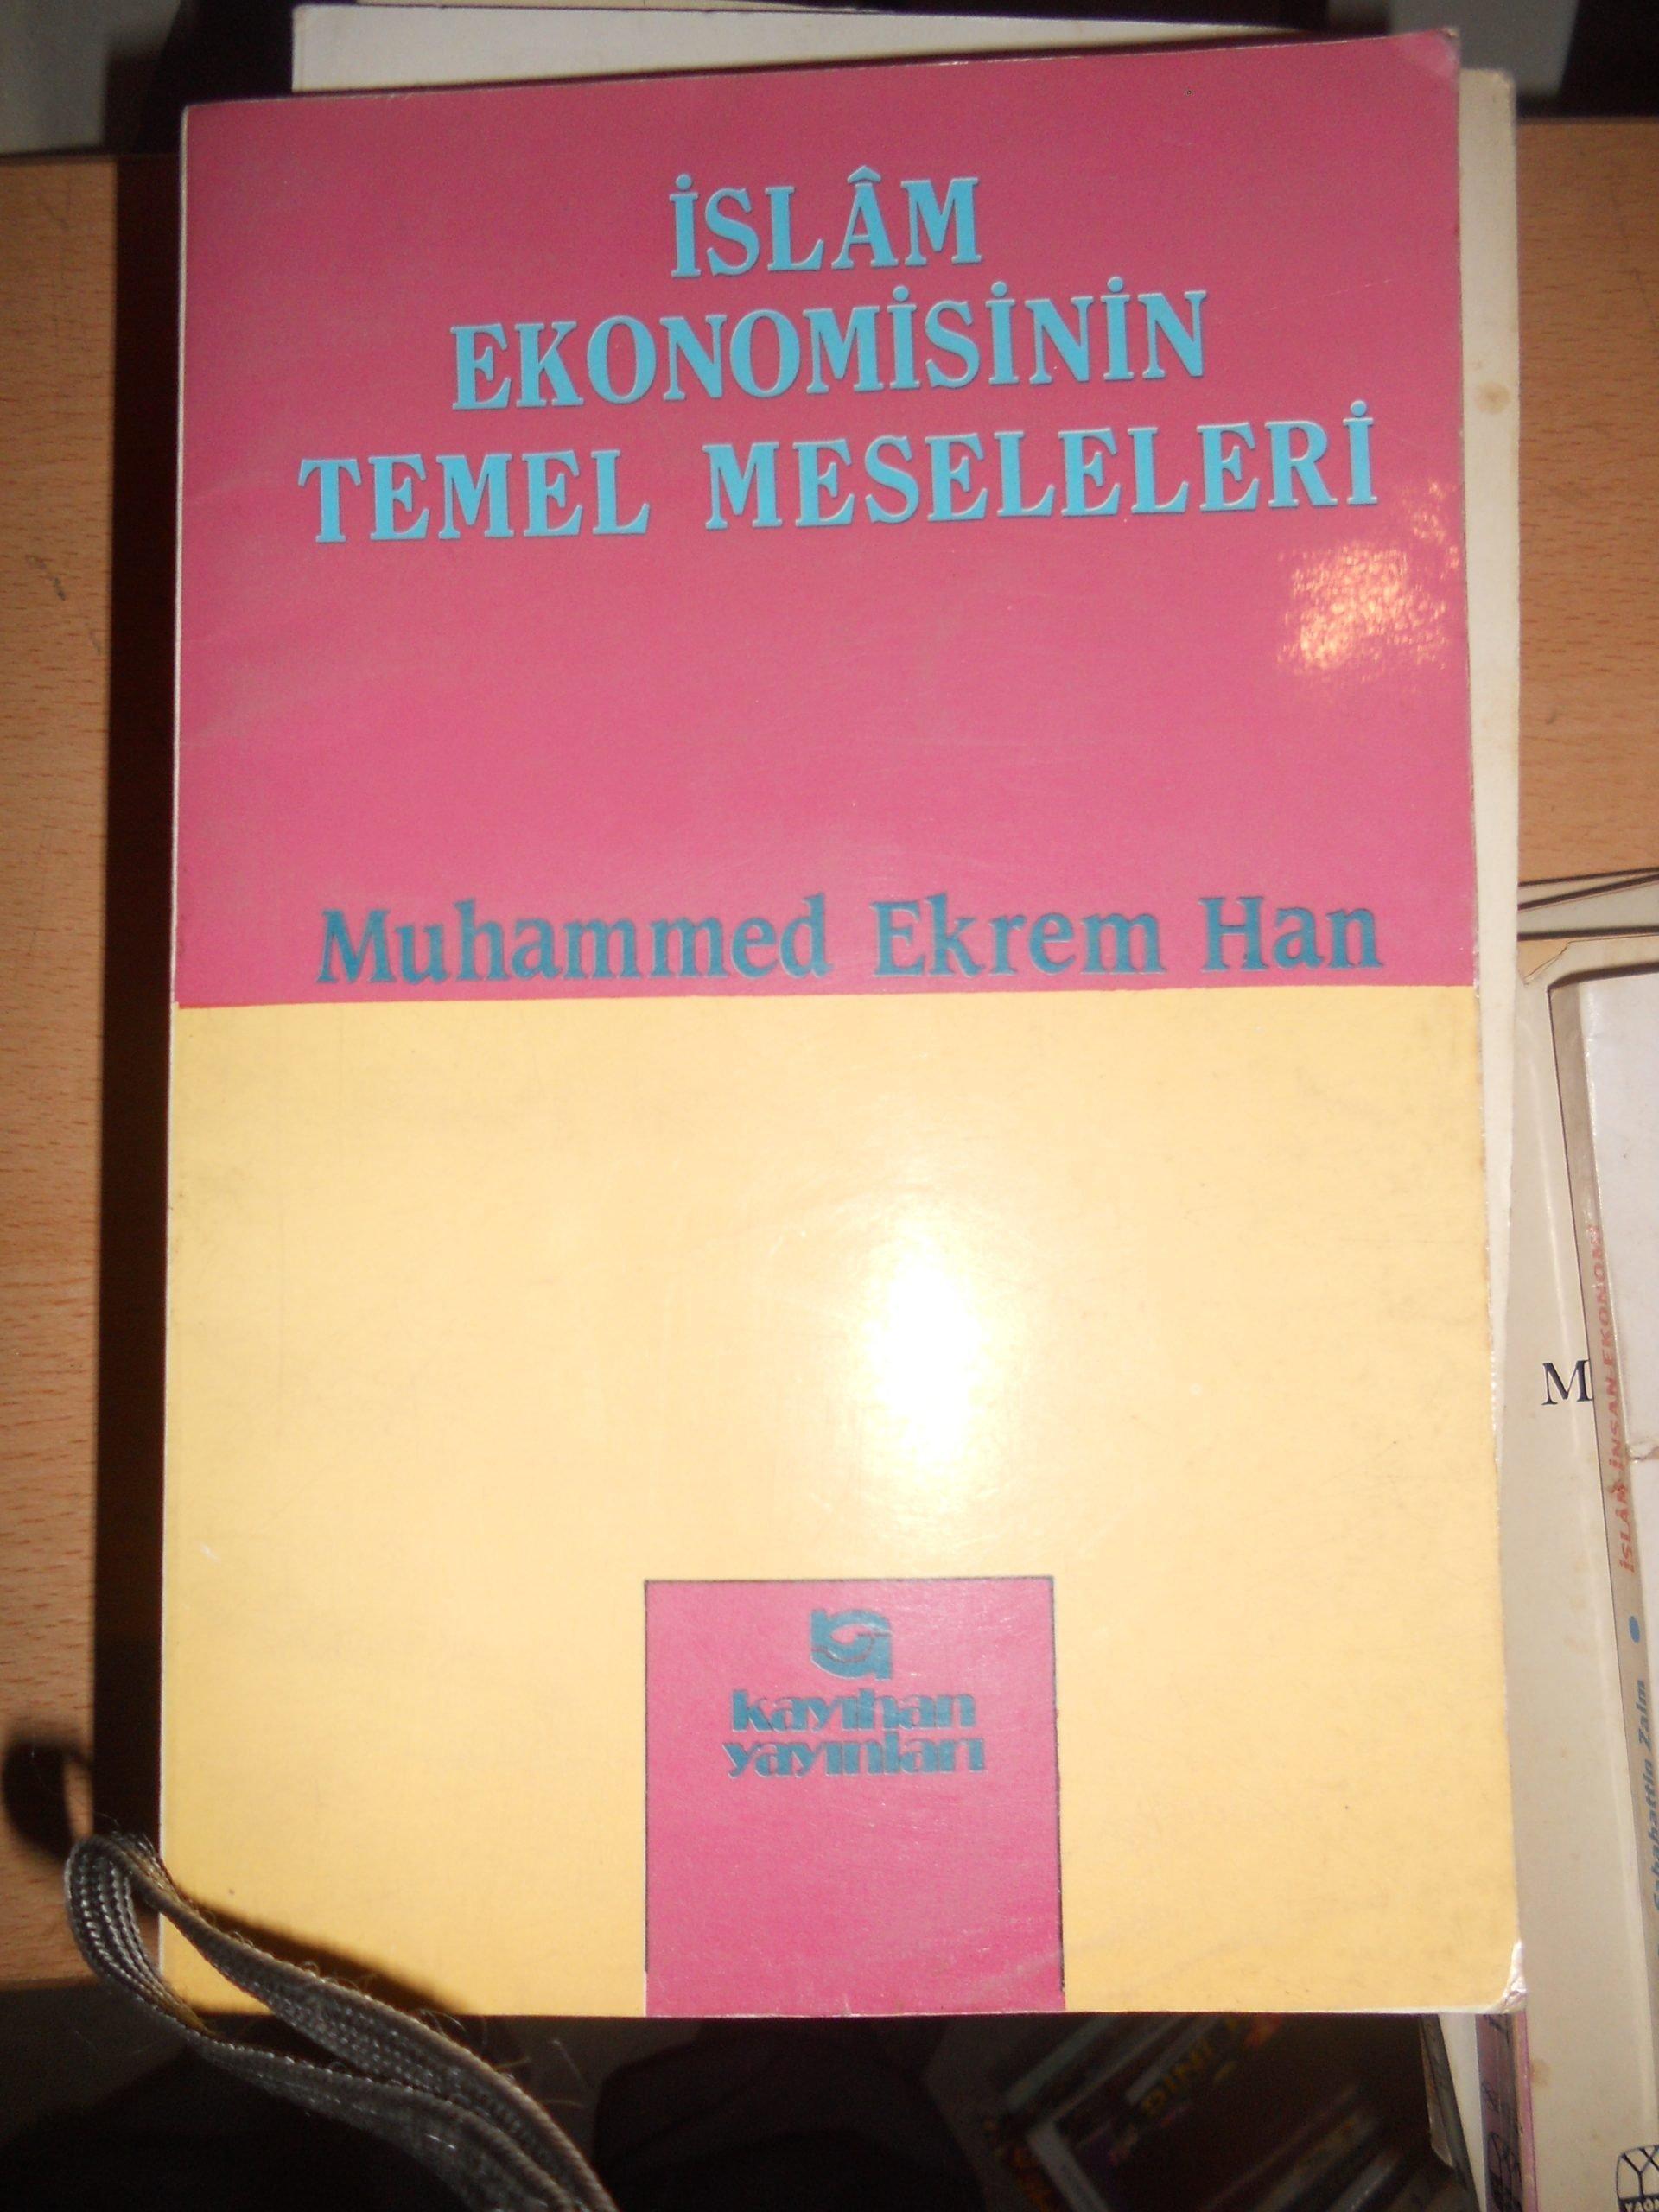 İSLAM EKONOMİSİNİN TEMEL MESELELERİ/Muhammed Ekrem Han/10 TL